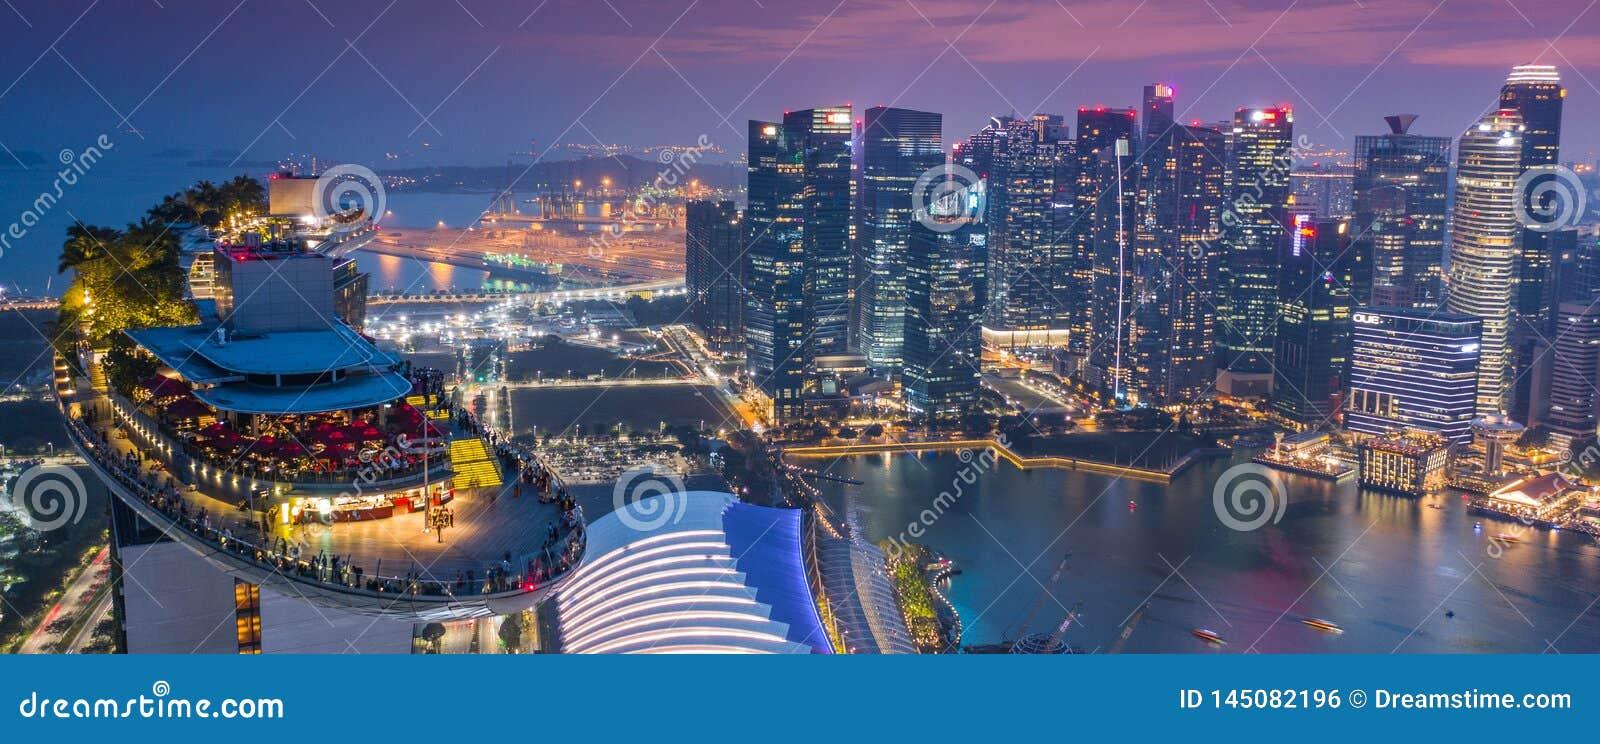 Marina Bay Hotel Skypark Skygarden Skybar på Singapore - rymdskepp